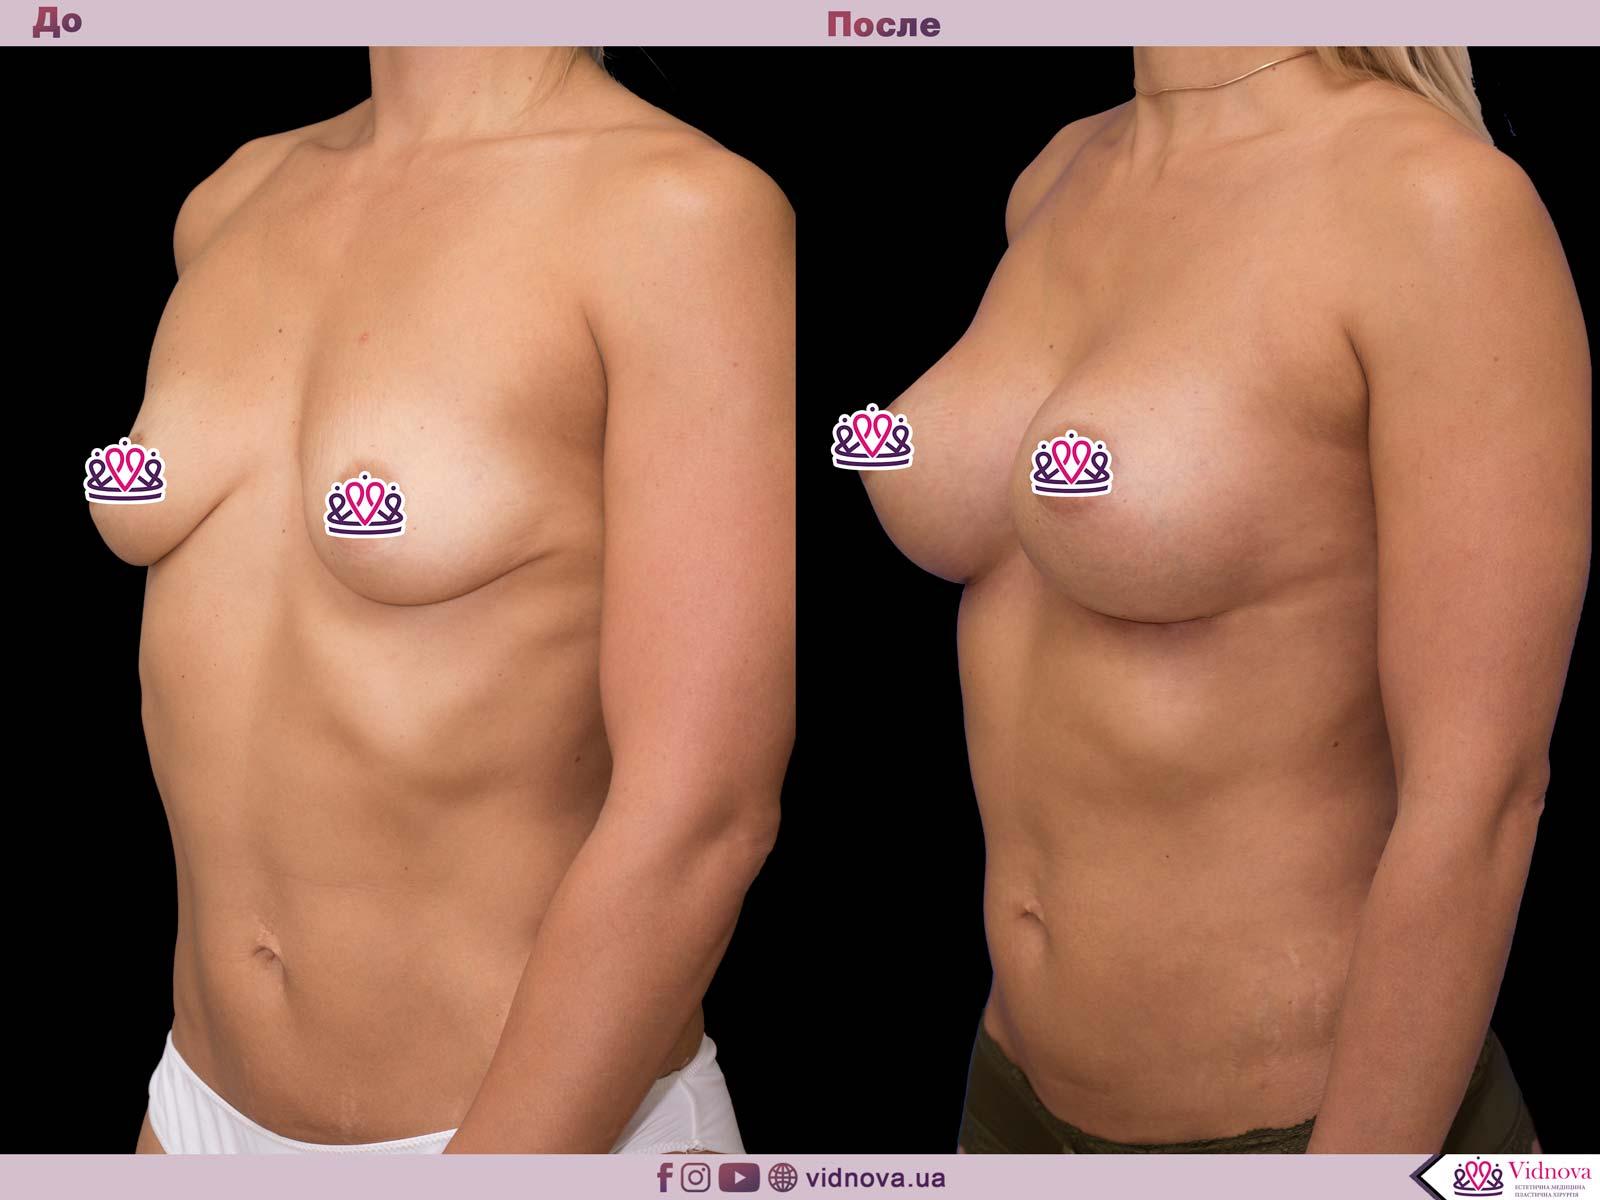 Увеличение груди: Фото ДО и ПОСЛЕ - Пример №41-2 - Клиника Vidnova